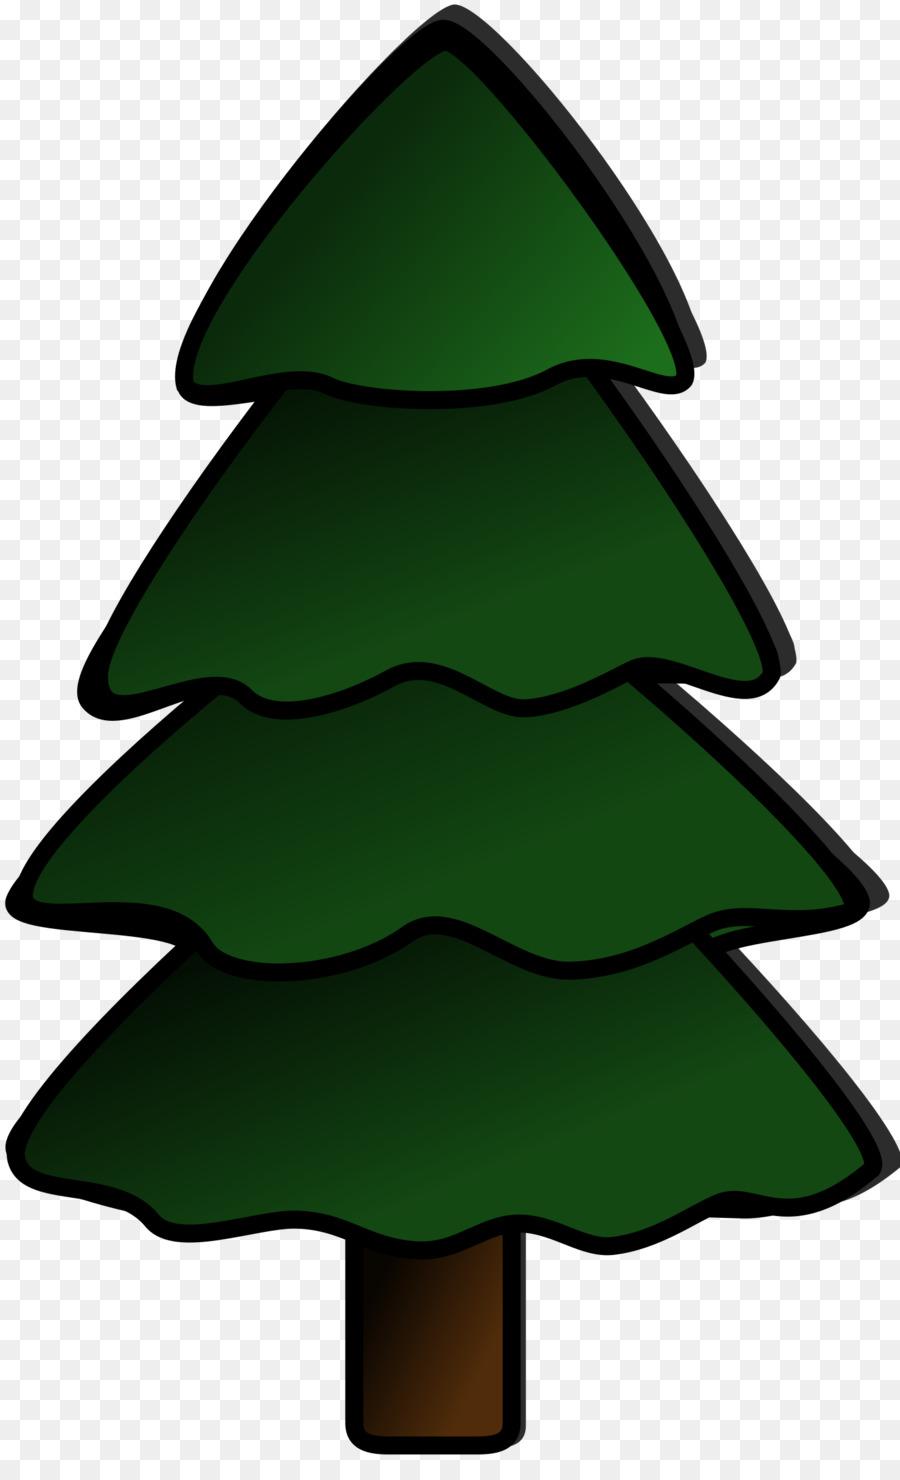 clip art pine tree clipart Pine Clip art